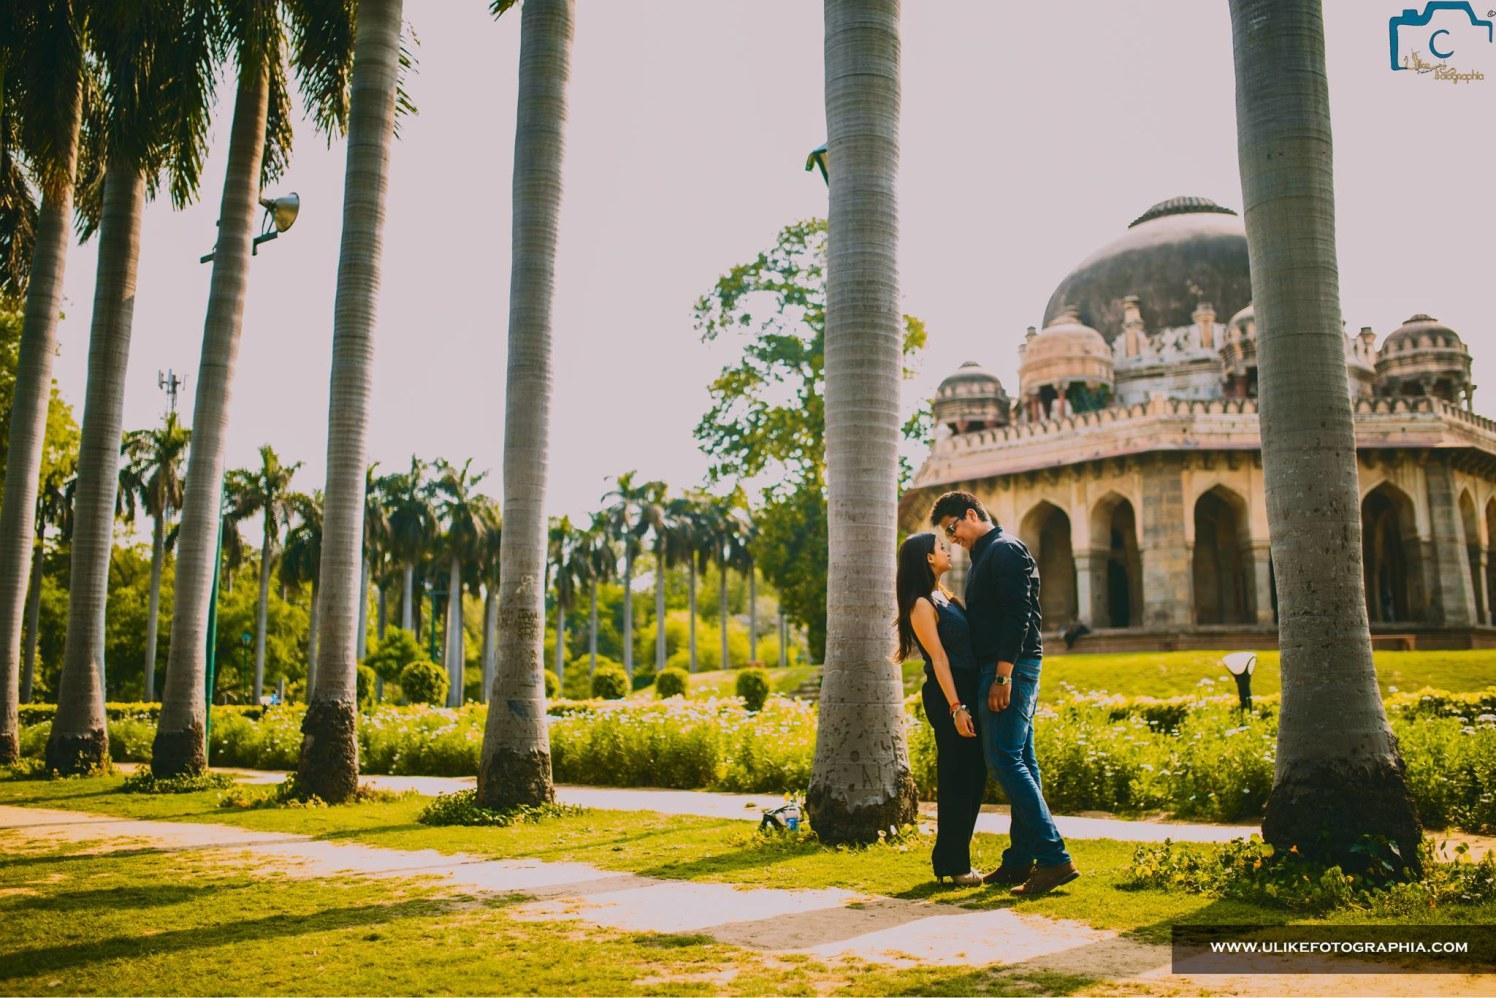 Monumental love by ULike Fotographia Wedding-photography | Weddings Photos & Ideas